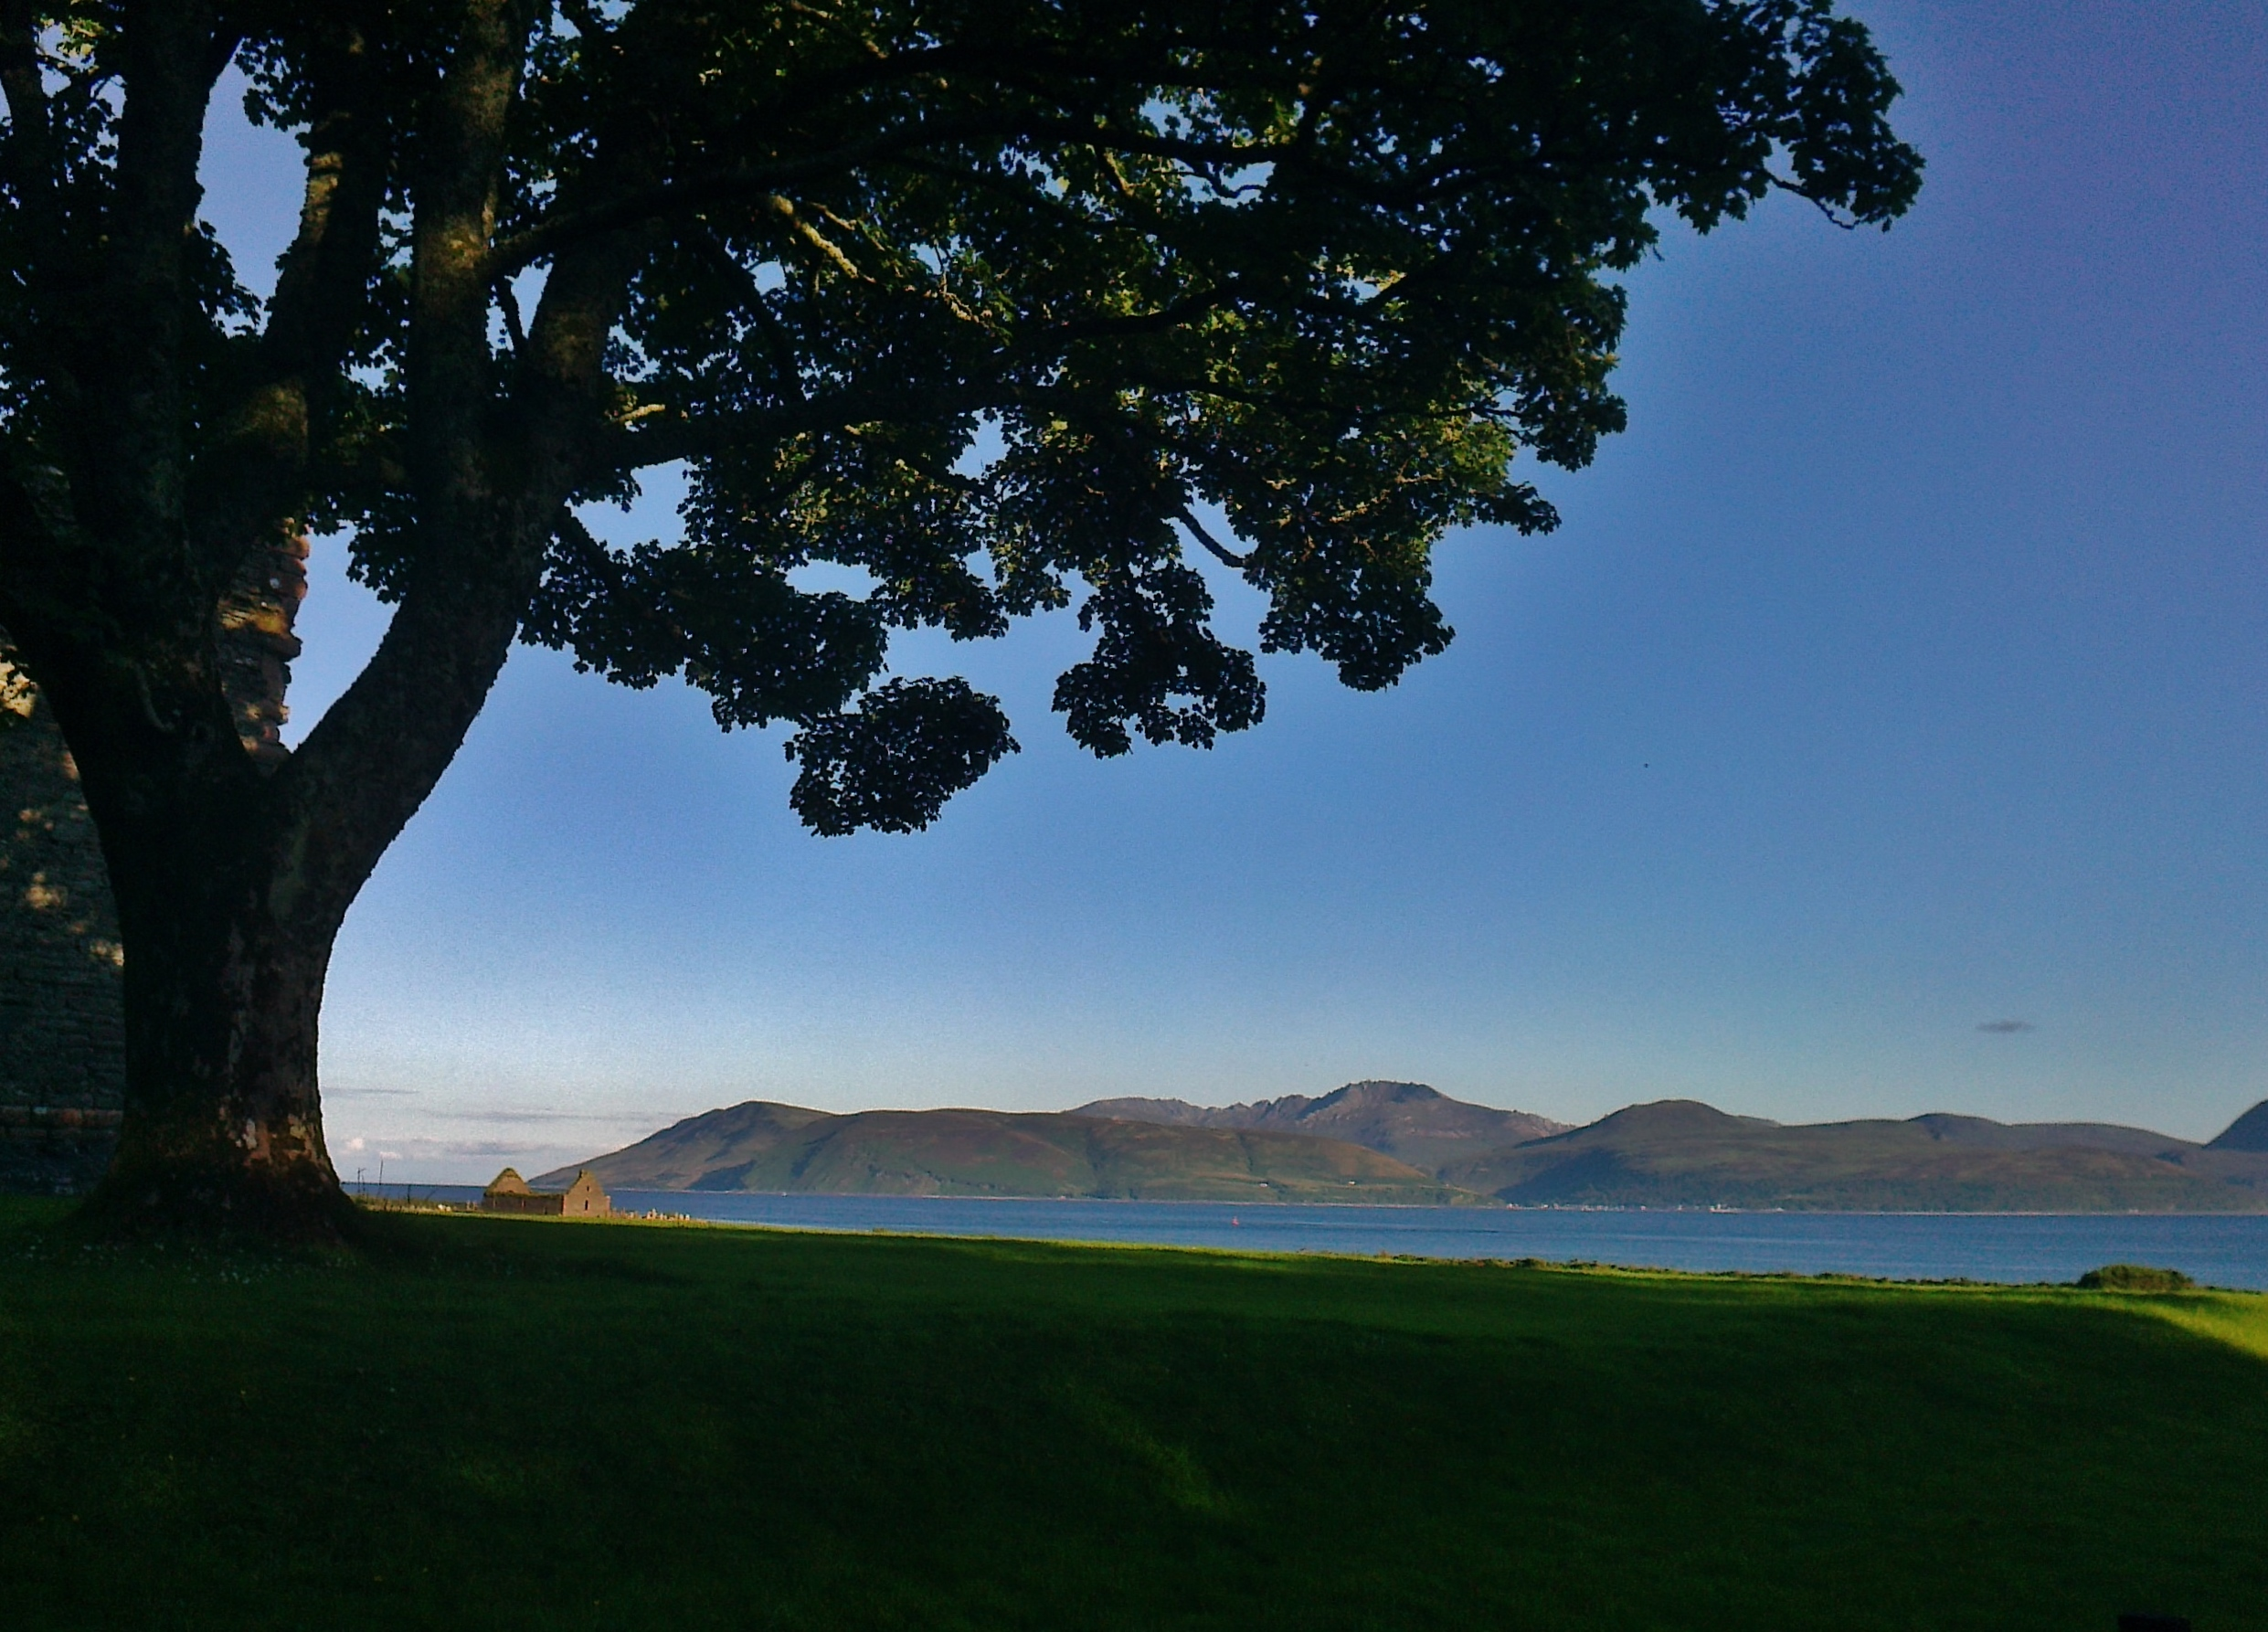 Isle of Arran from Clonaig, Kintyre